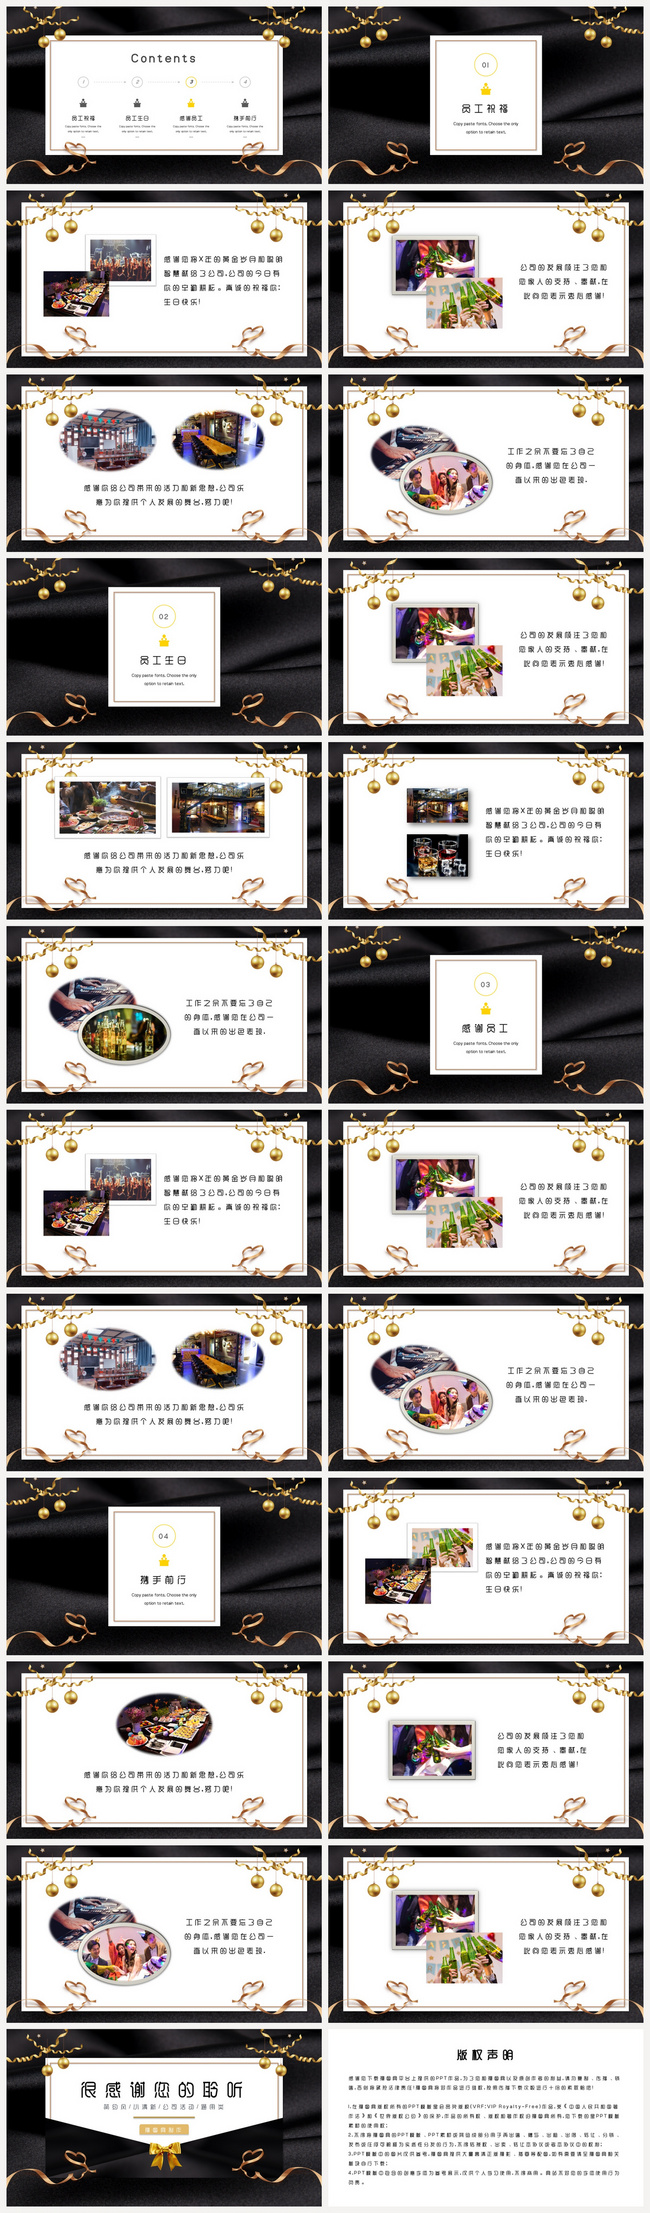 Template Ppt Album Foto Karyawan Pesta Ulang Tahun Emas Hitam Gambar Unduh Gratis Power Point 401045559 Format Gambar Pptx Lovepik Com